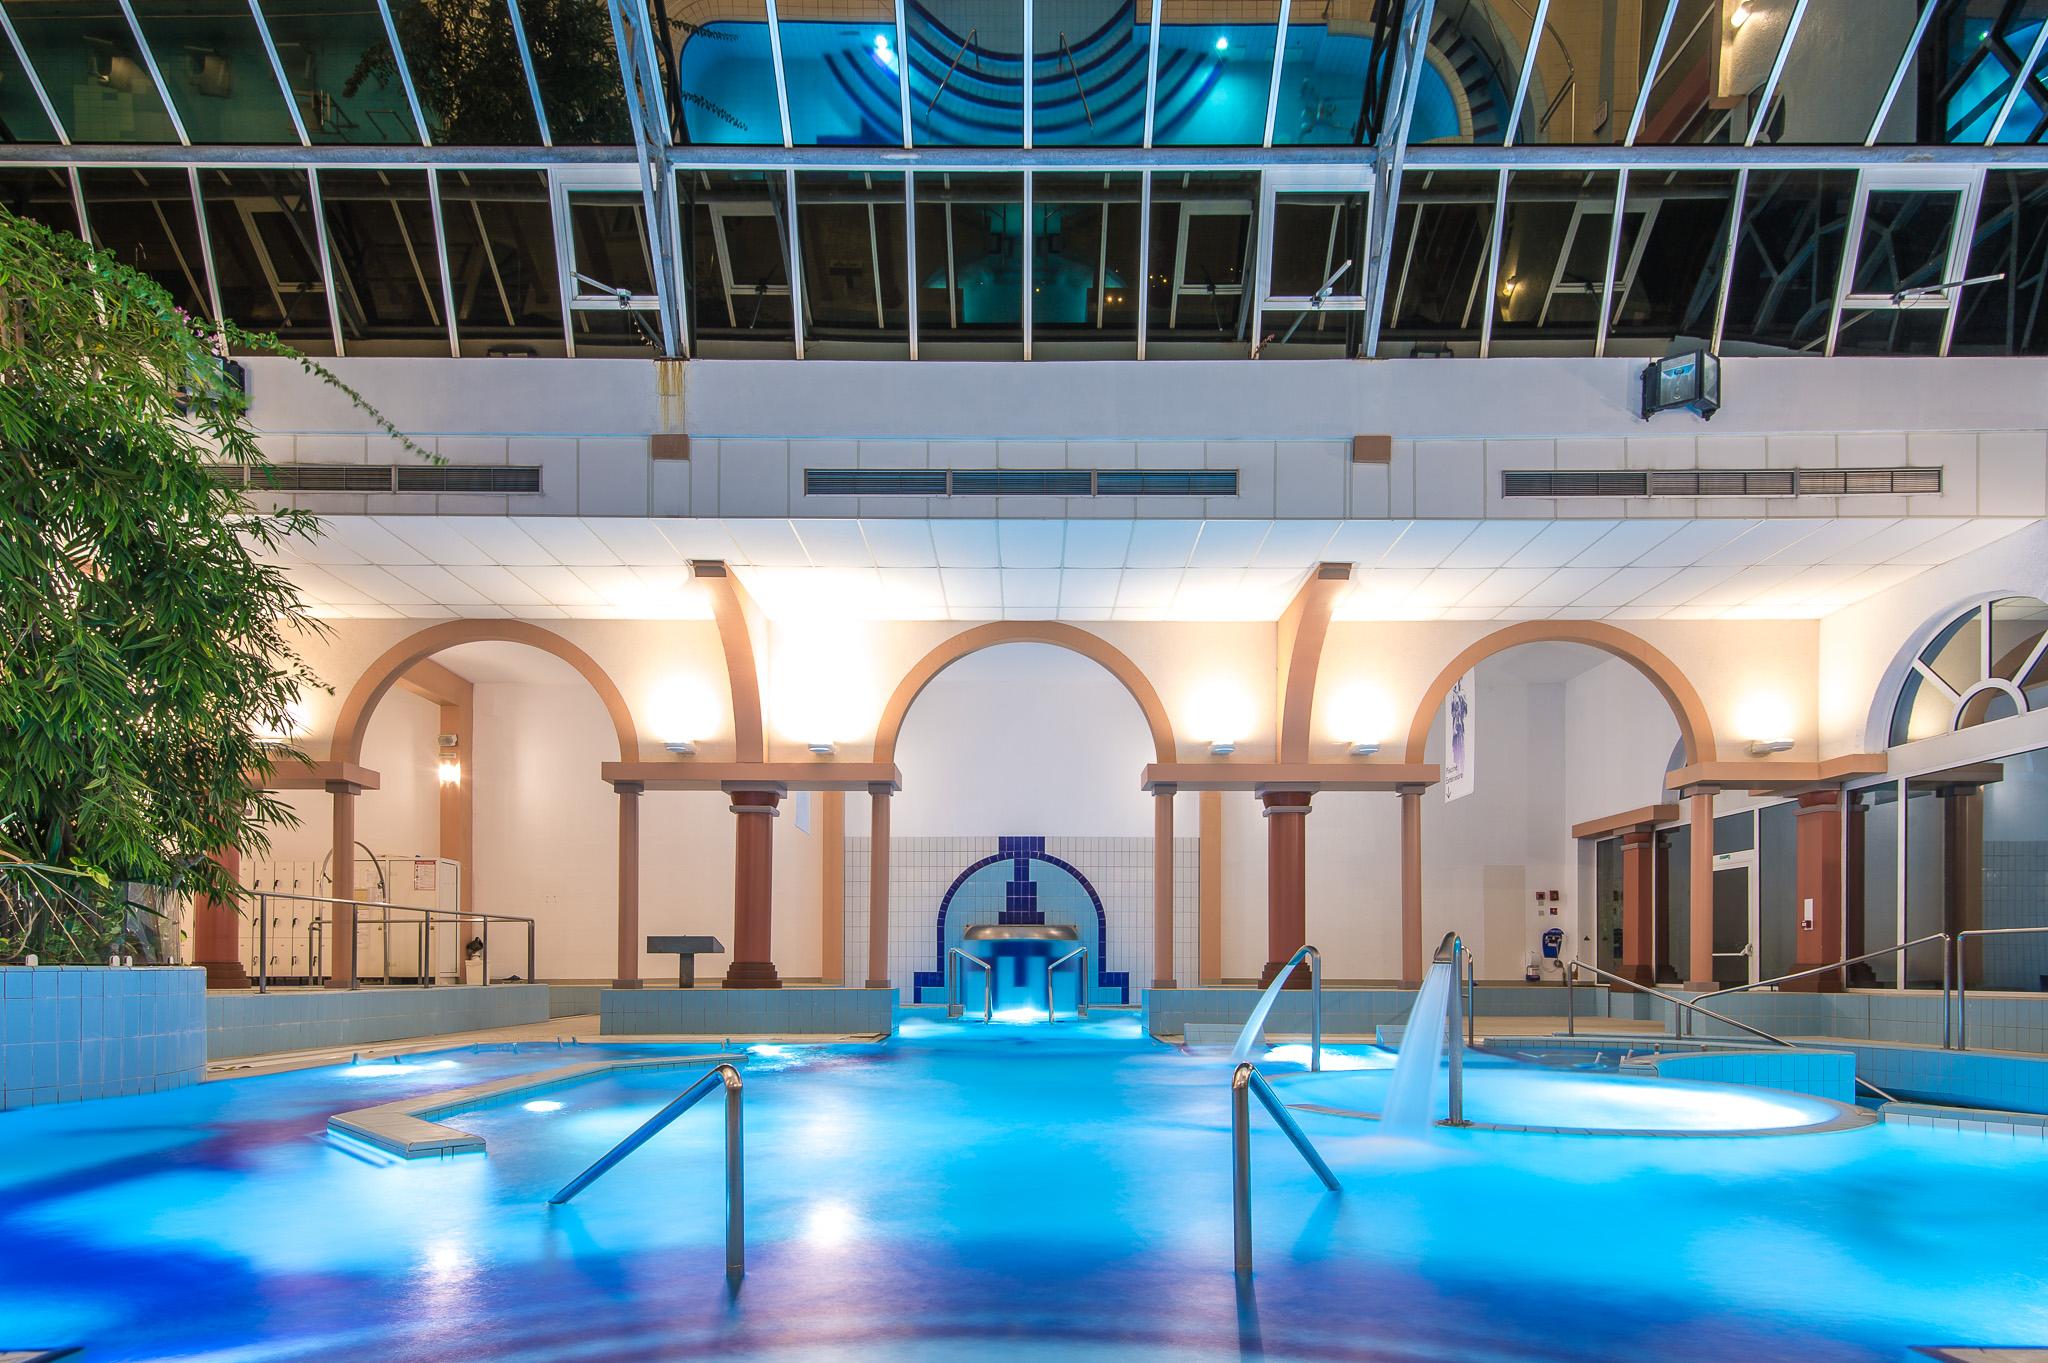 piscine inté nuit Borda_©jpeg_studios013-2